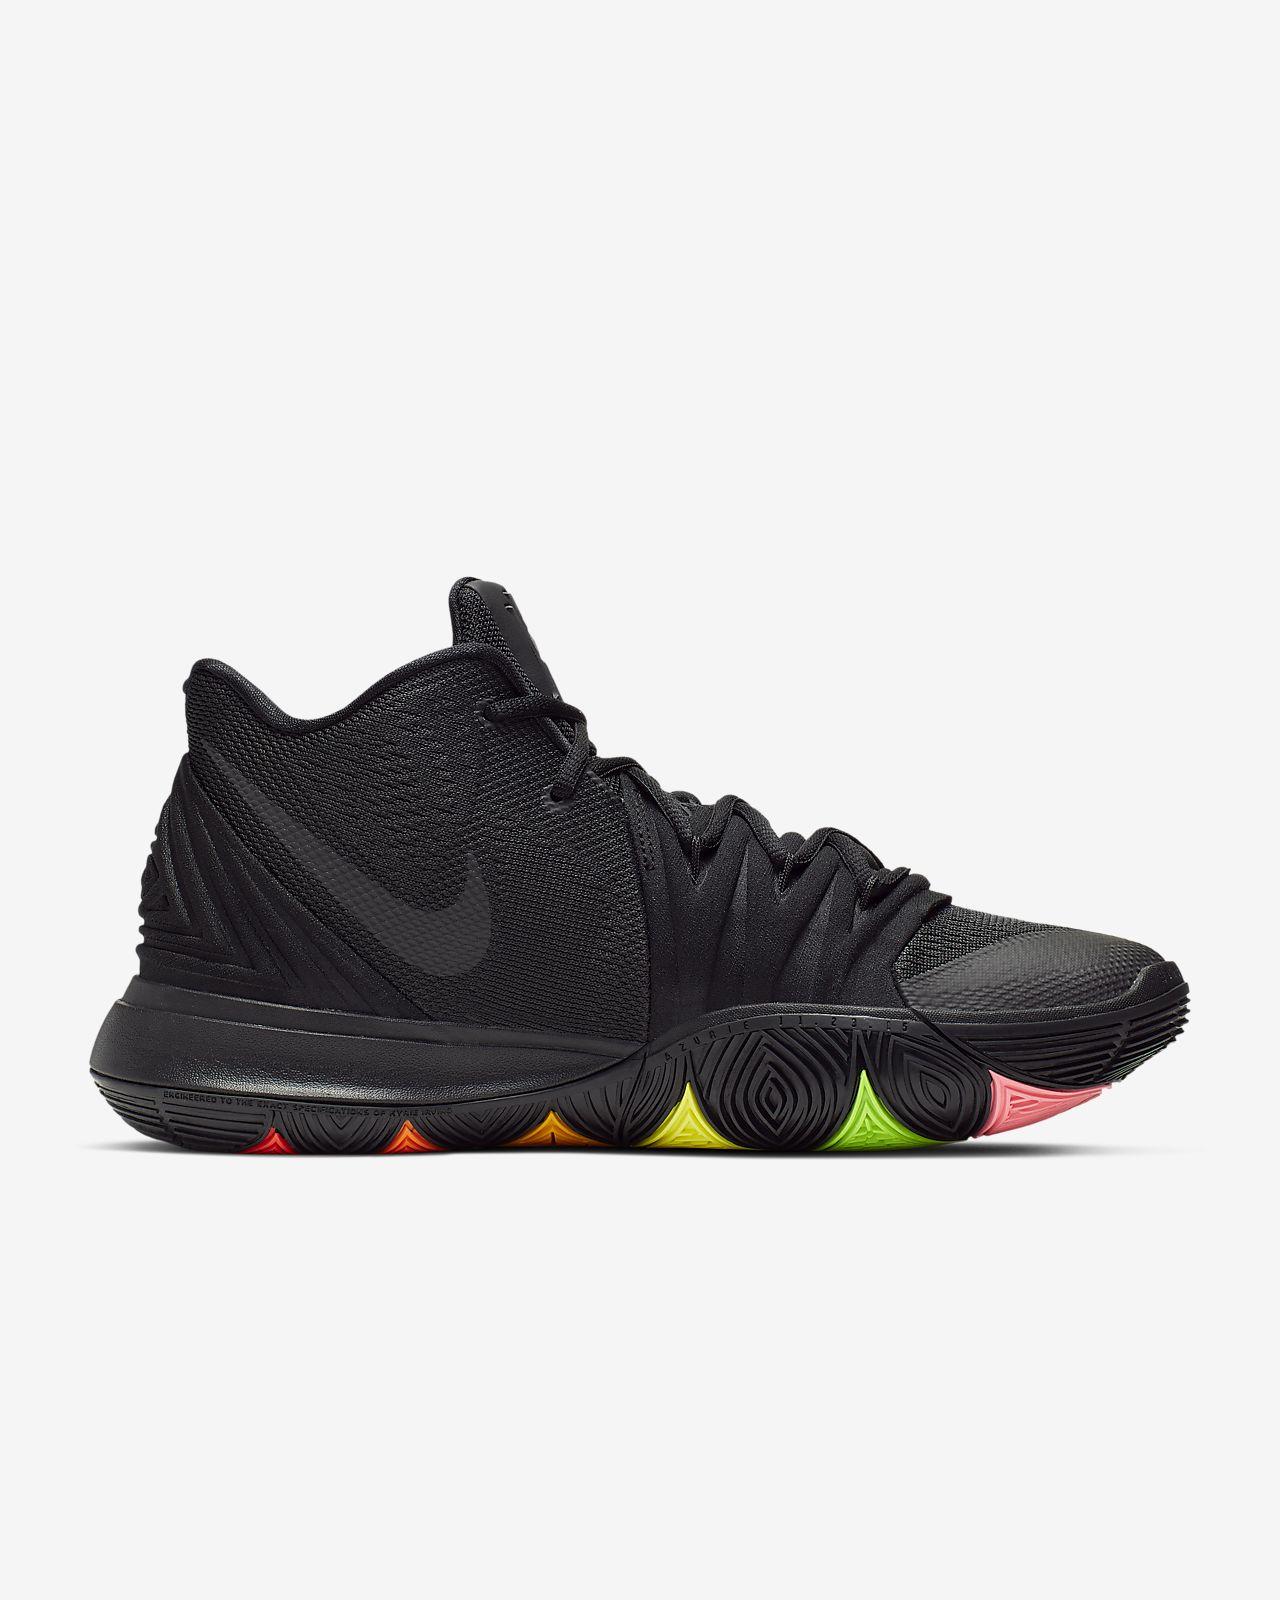 b1e8d36a8 Low Resolution Kyrie 5 Basketball Shoe Kyrie 5 Basketball Shoe